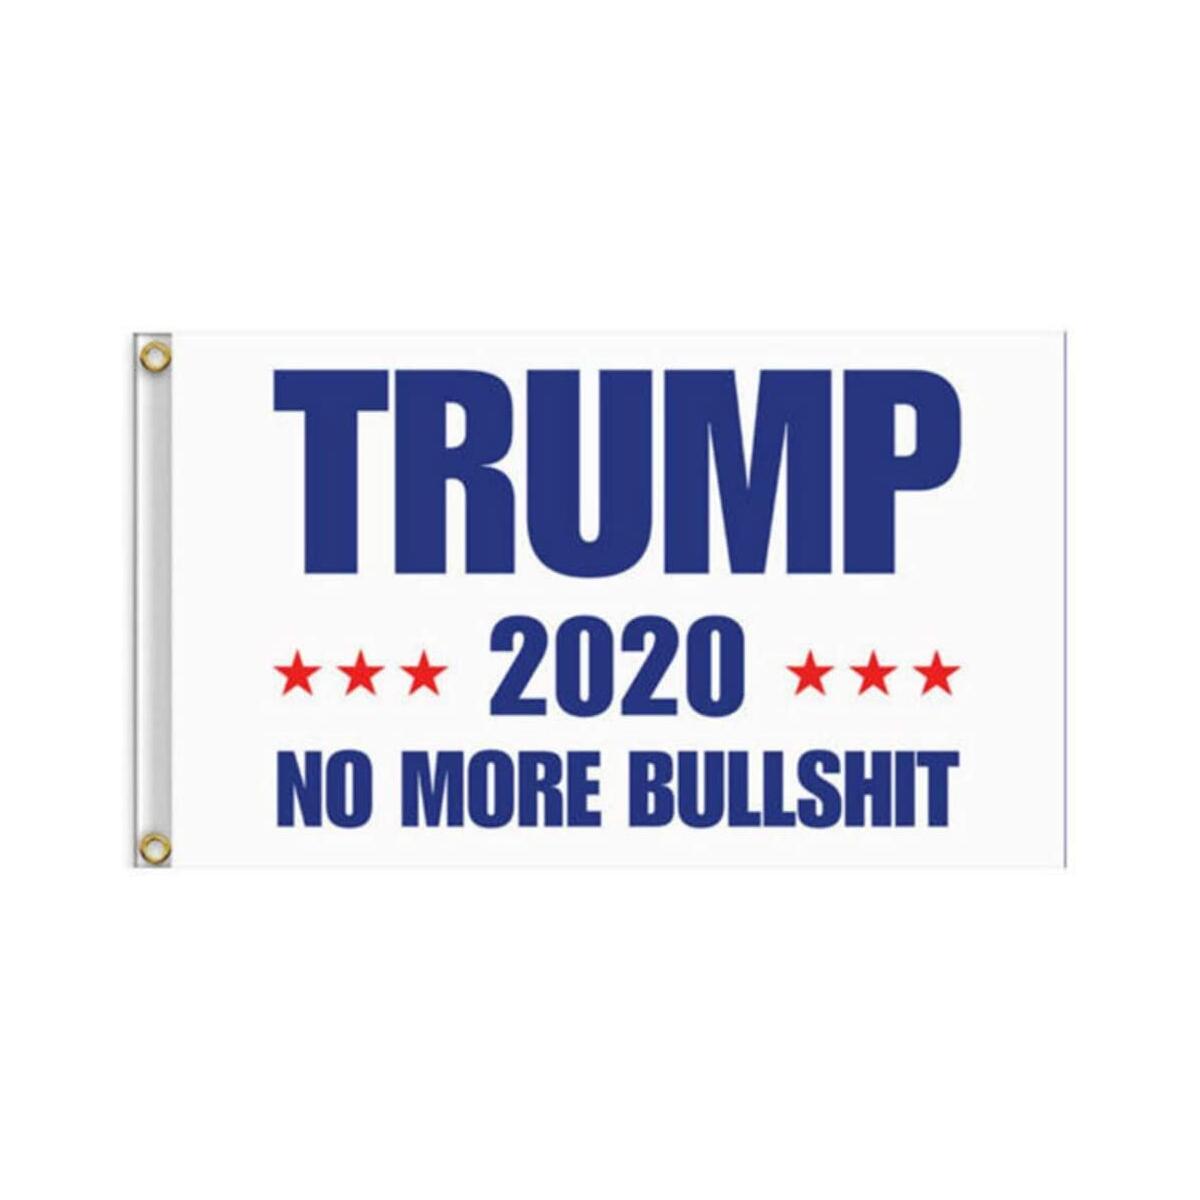 Vogshine Donald Trump Flag - 2020 Trump President Flags No More Bullshit Keep America Great Flag 3x5 ft (White)